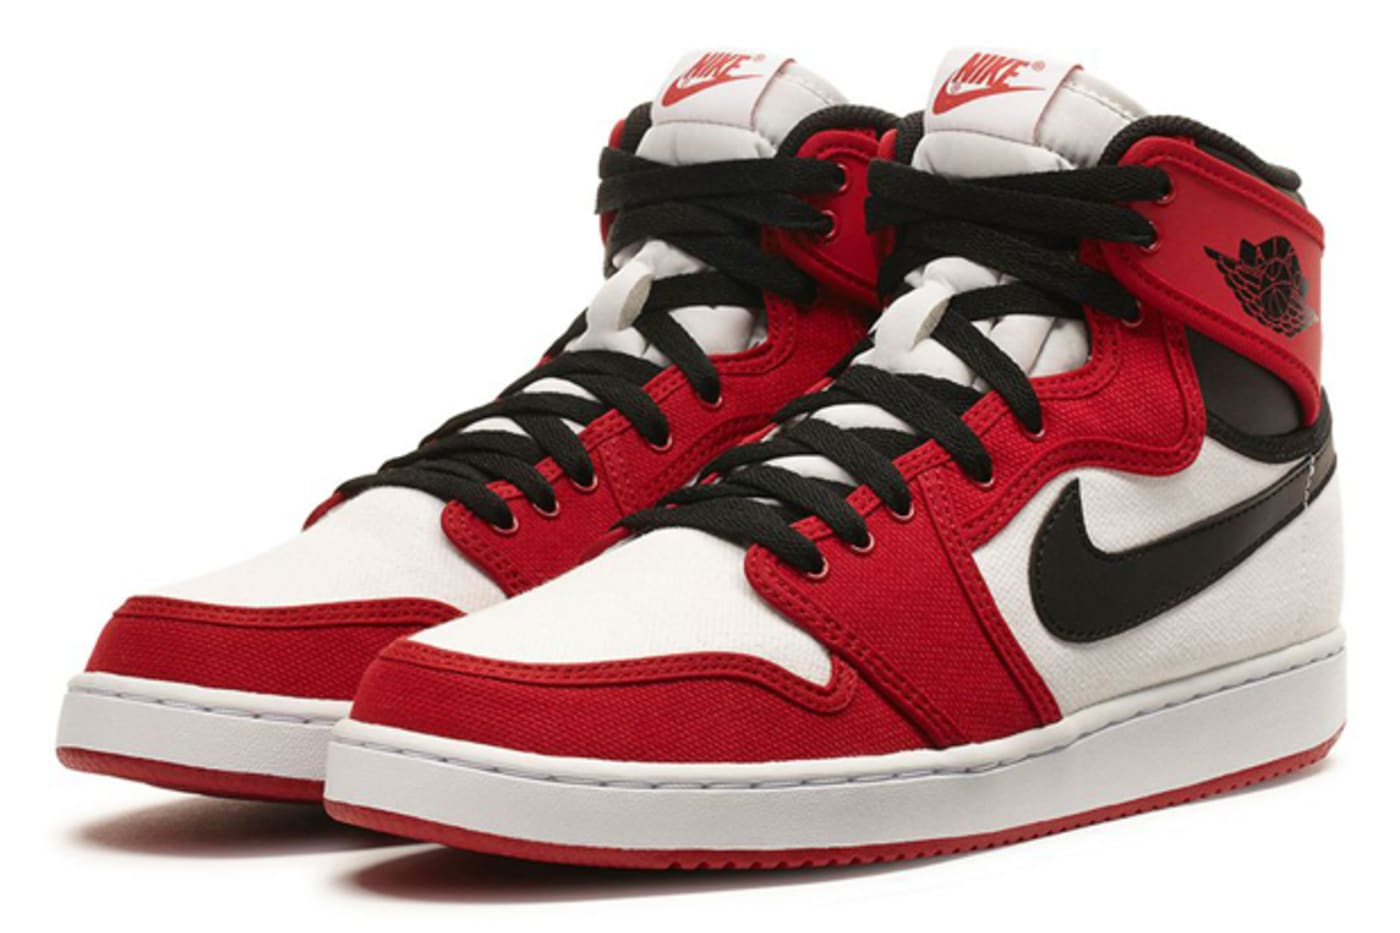 The Best Air Jordans of 2014 (So Far)   Complex